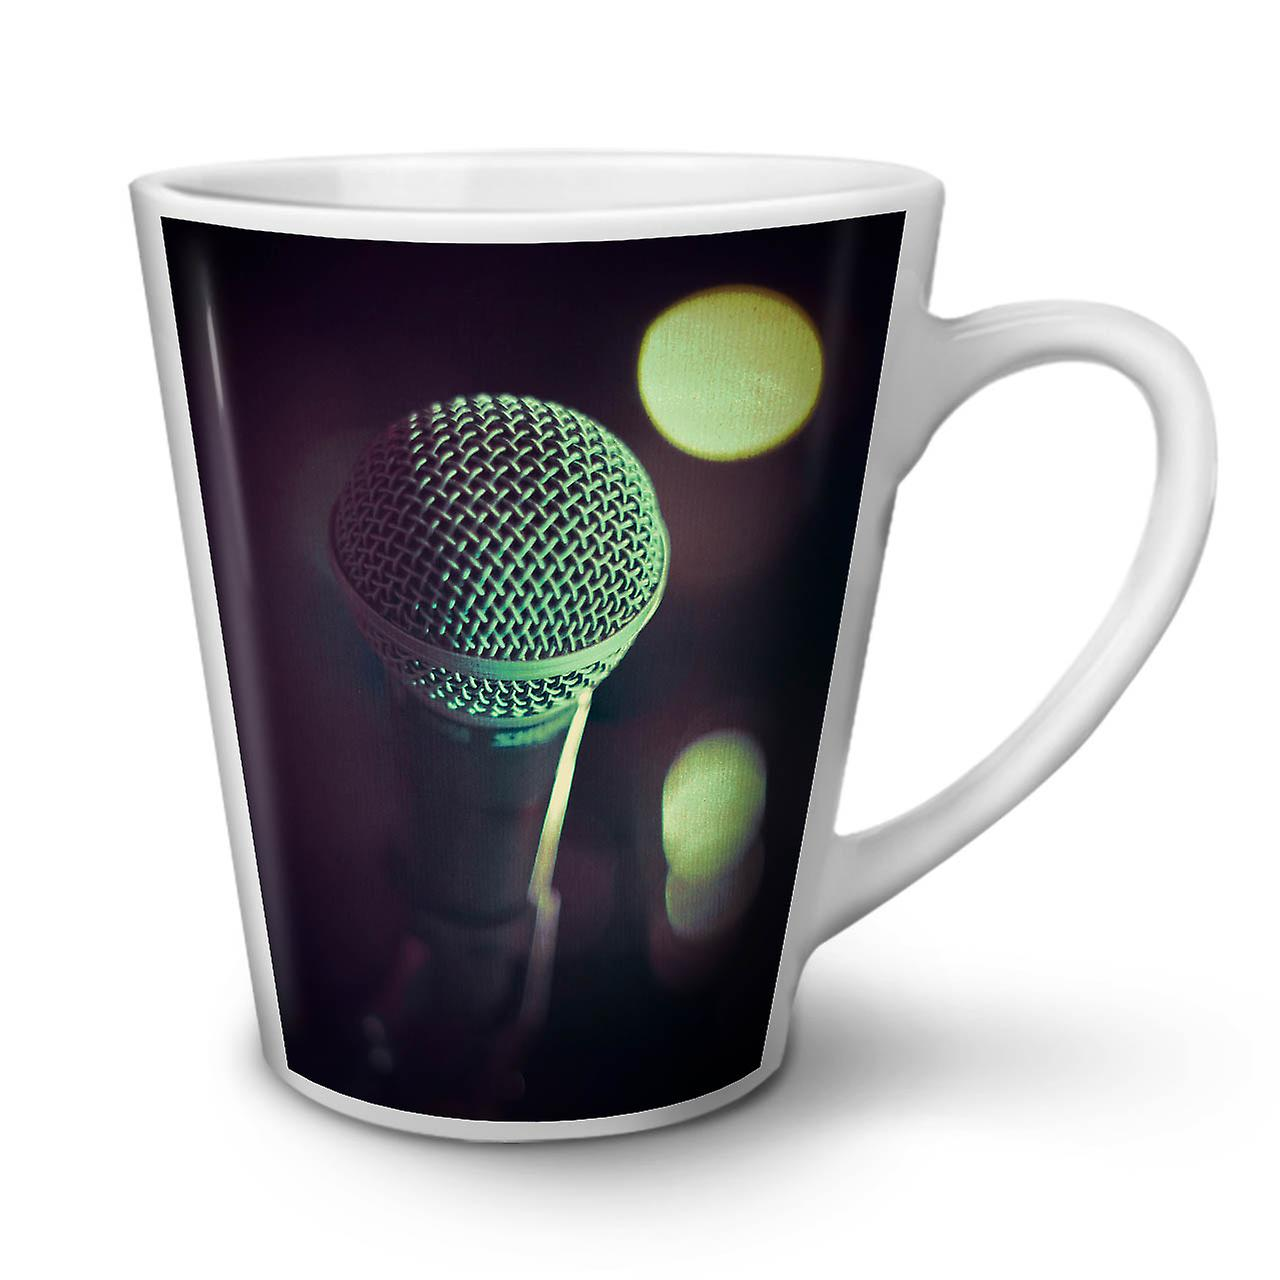 Café 12 Blanche Chant Latte OzWellcoda Tasse Micro Céramique Nouveau En wPZTkuOXi